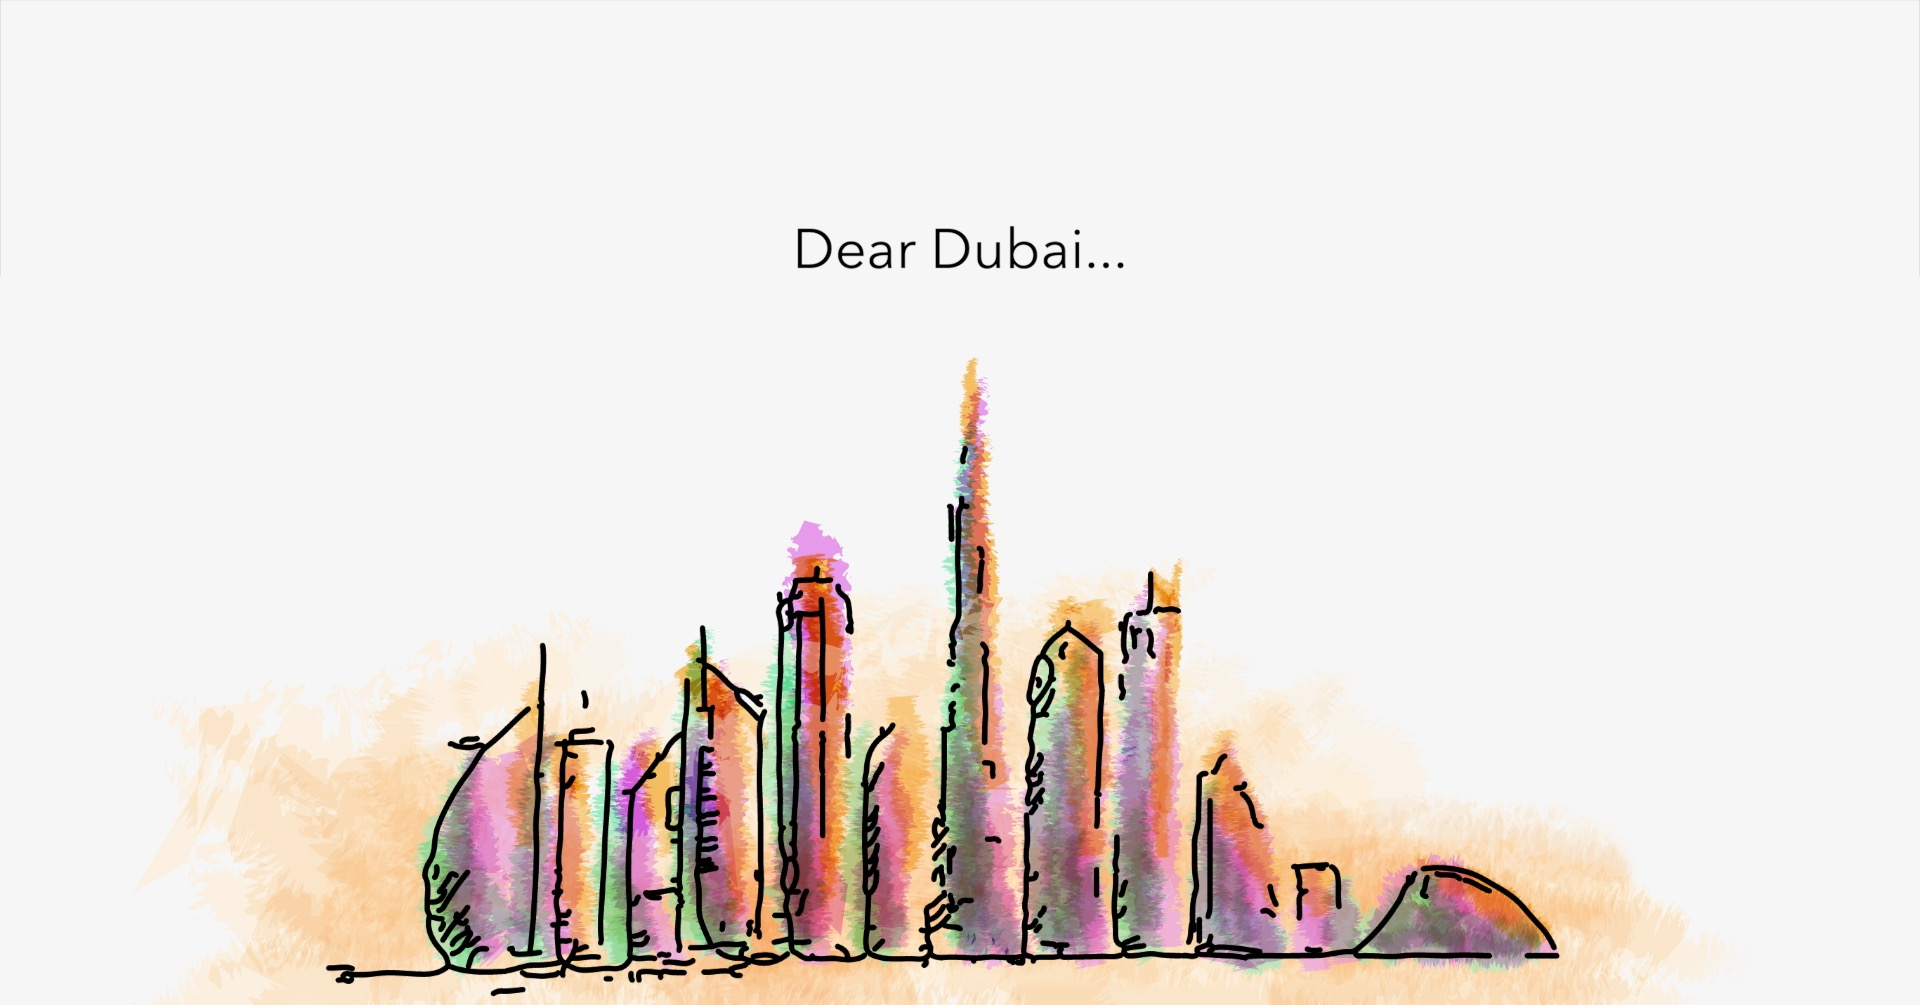 insydo Dear Dubai campaign